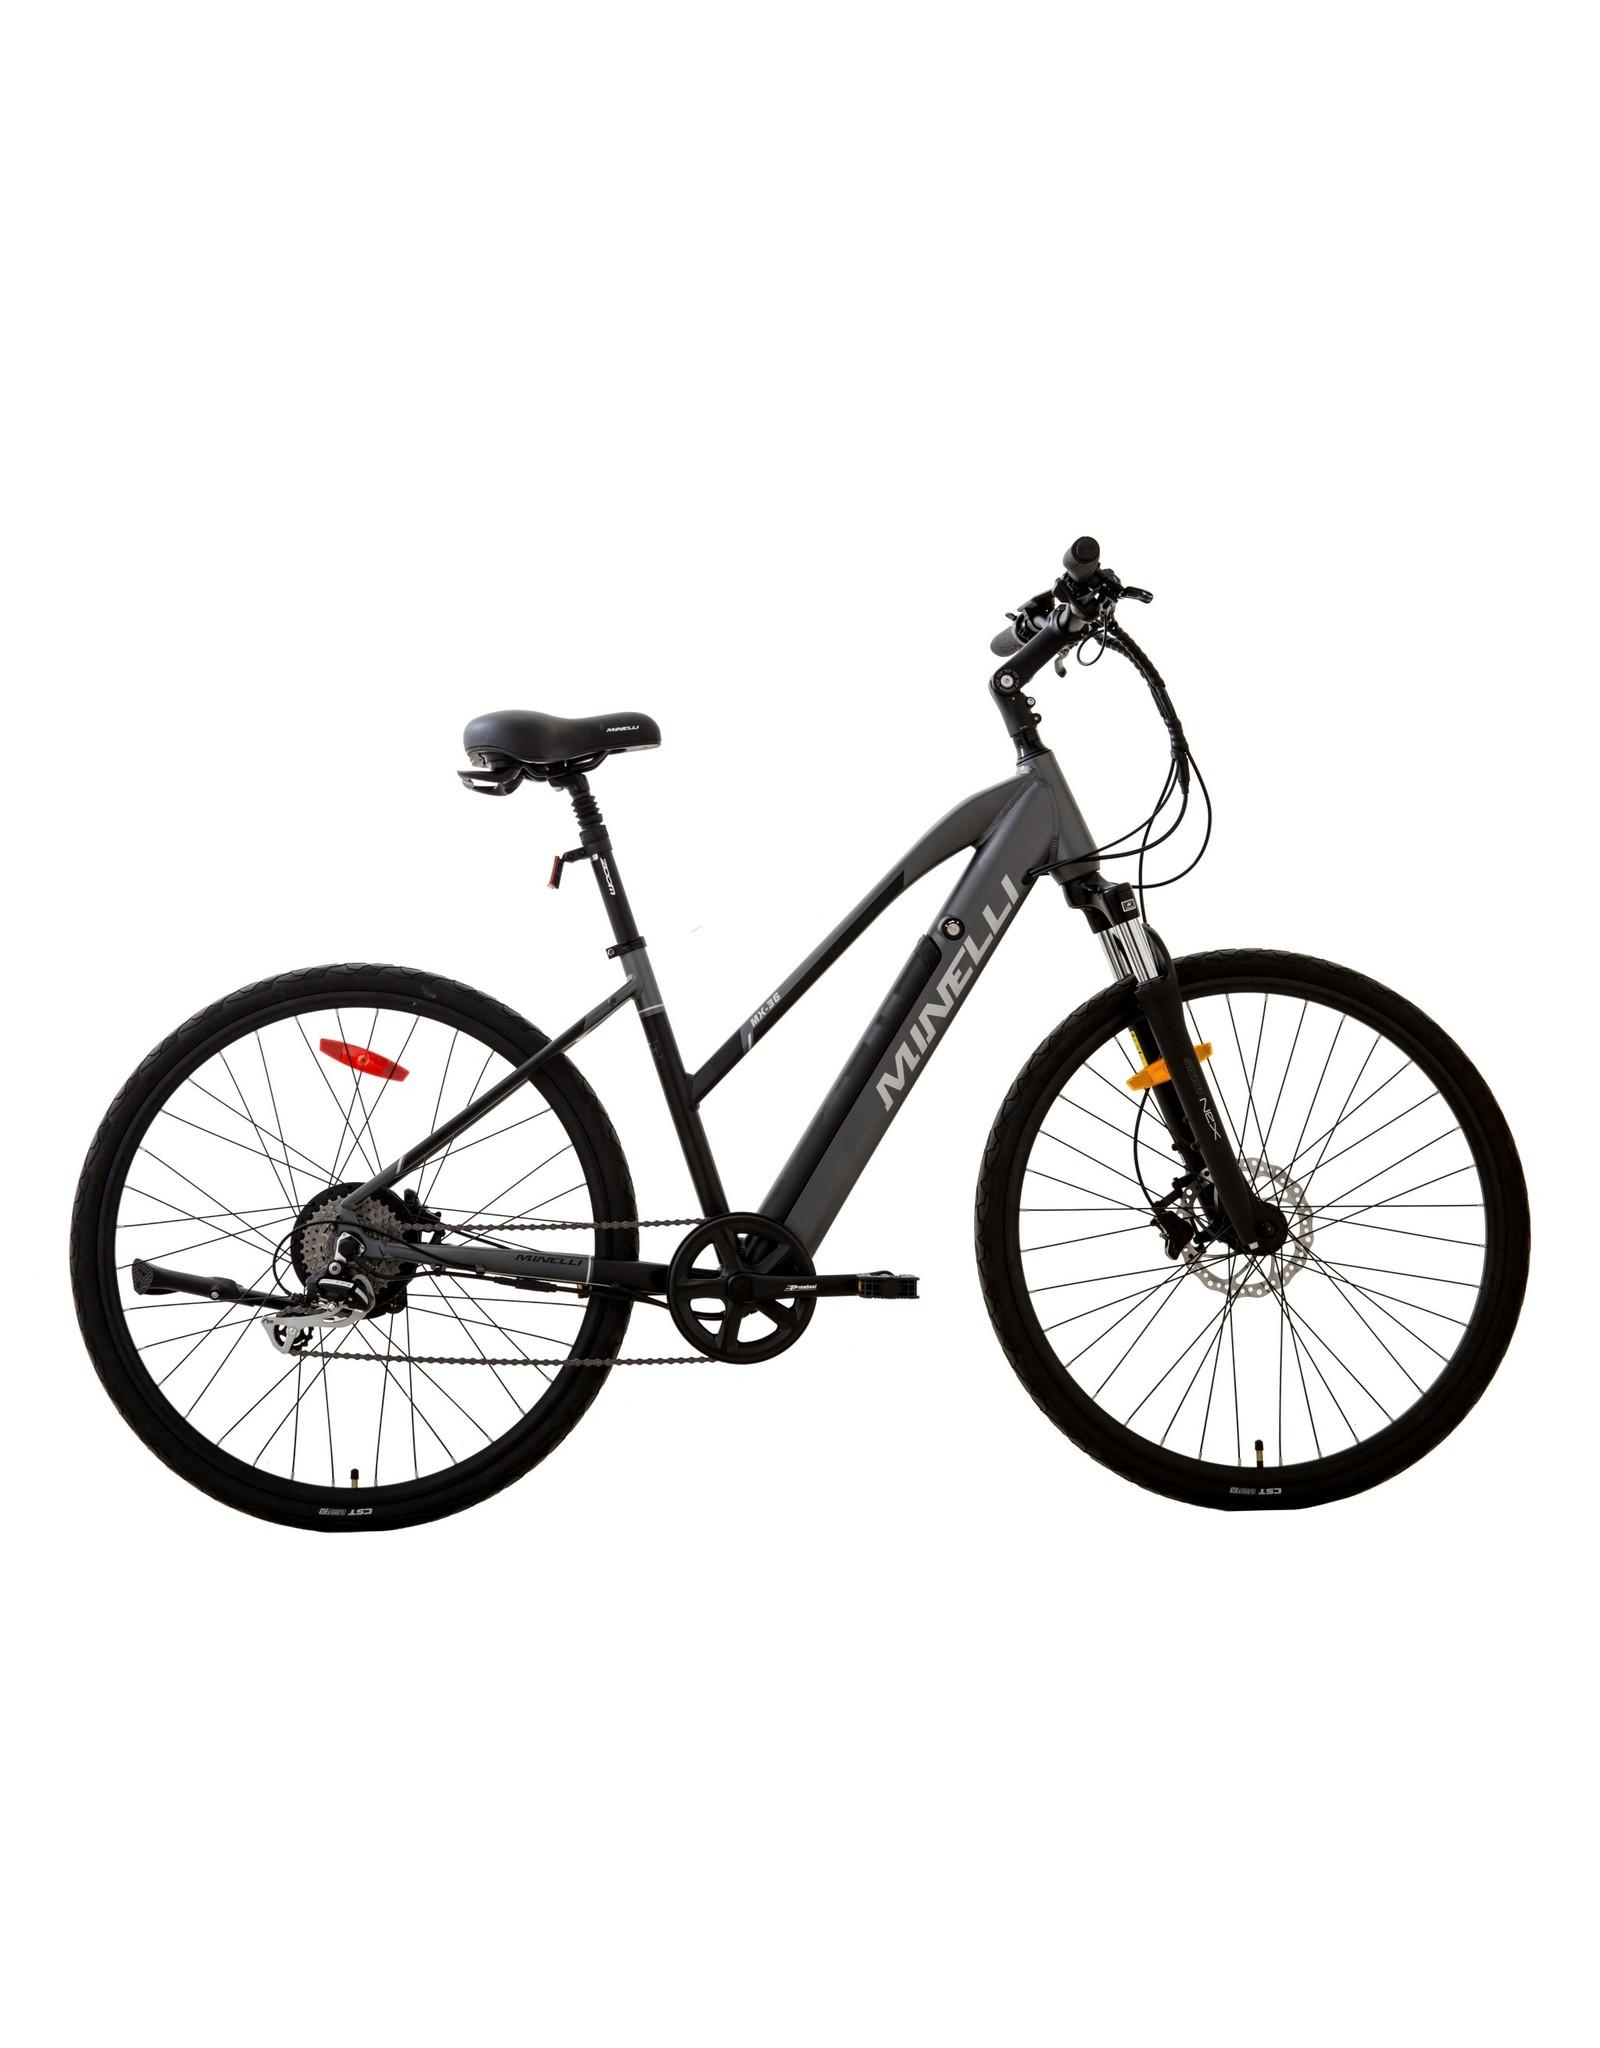 Minelli Electric Bike - MX-36